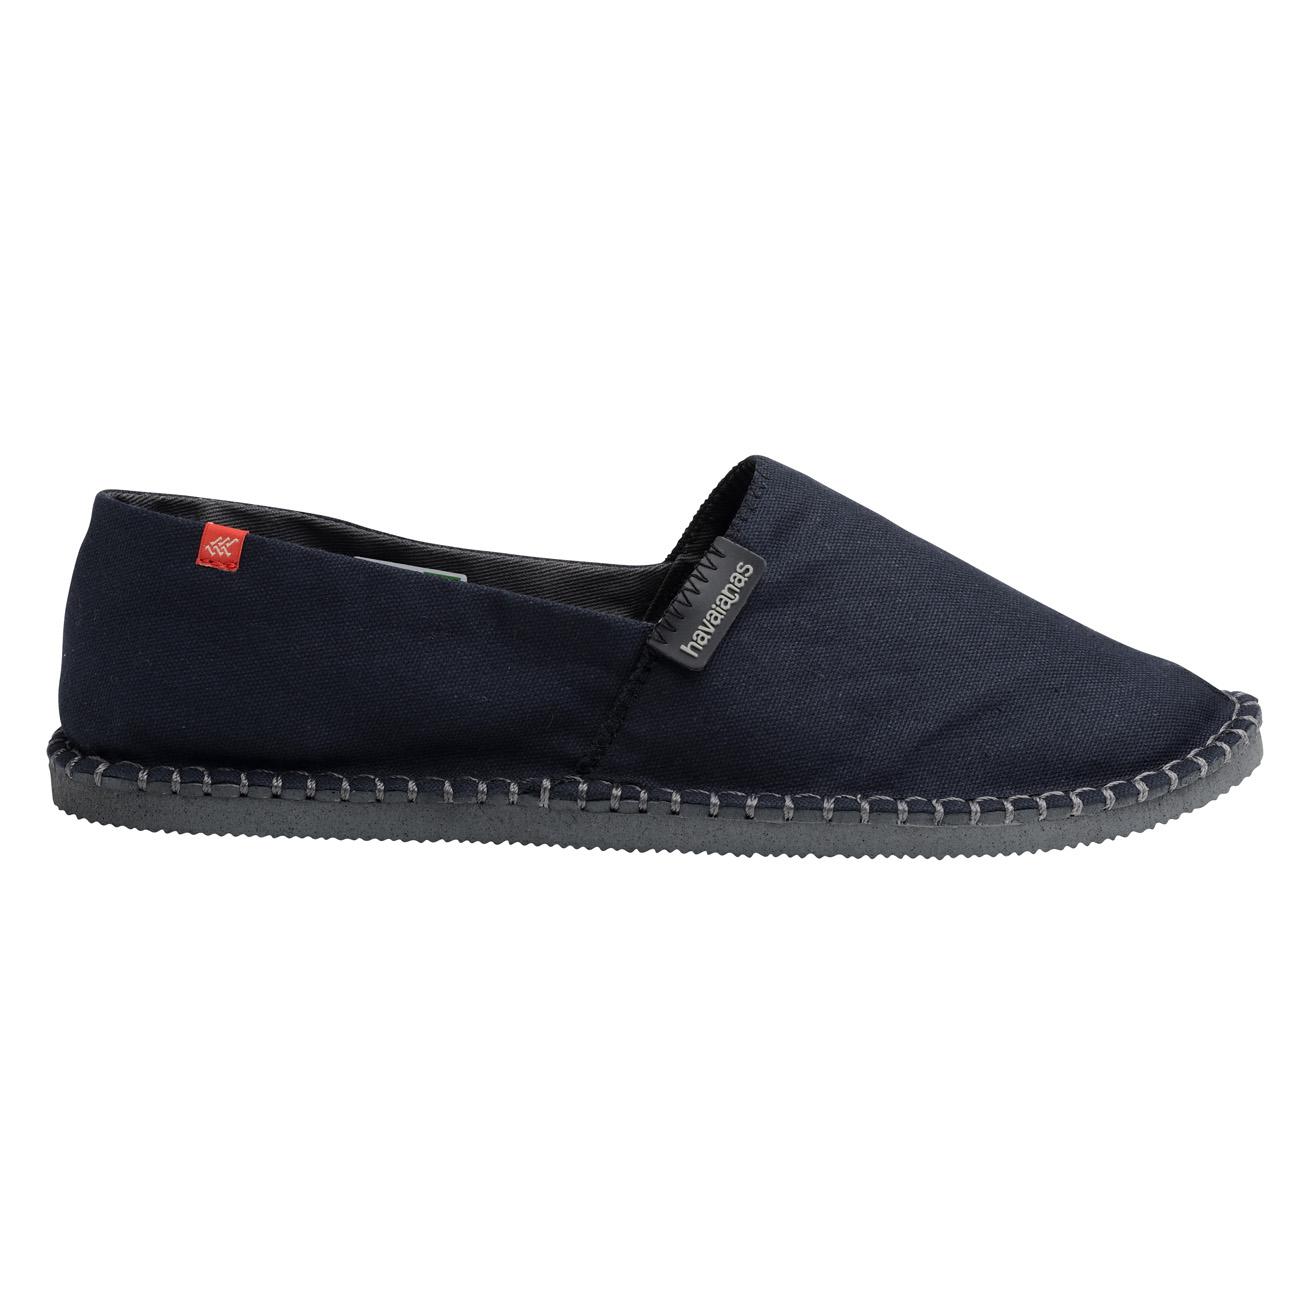 BLACK WHITE Shoe Size Uk 11,12,13 HAVAIANAS Kids Origine ESPADRILLES PINK